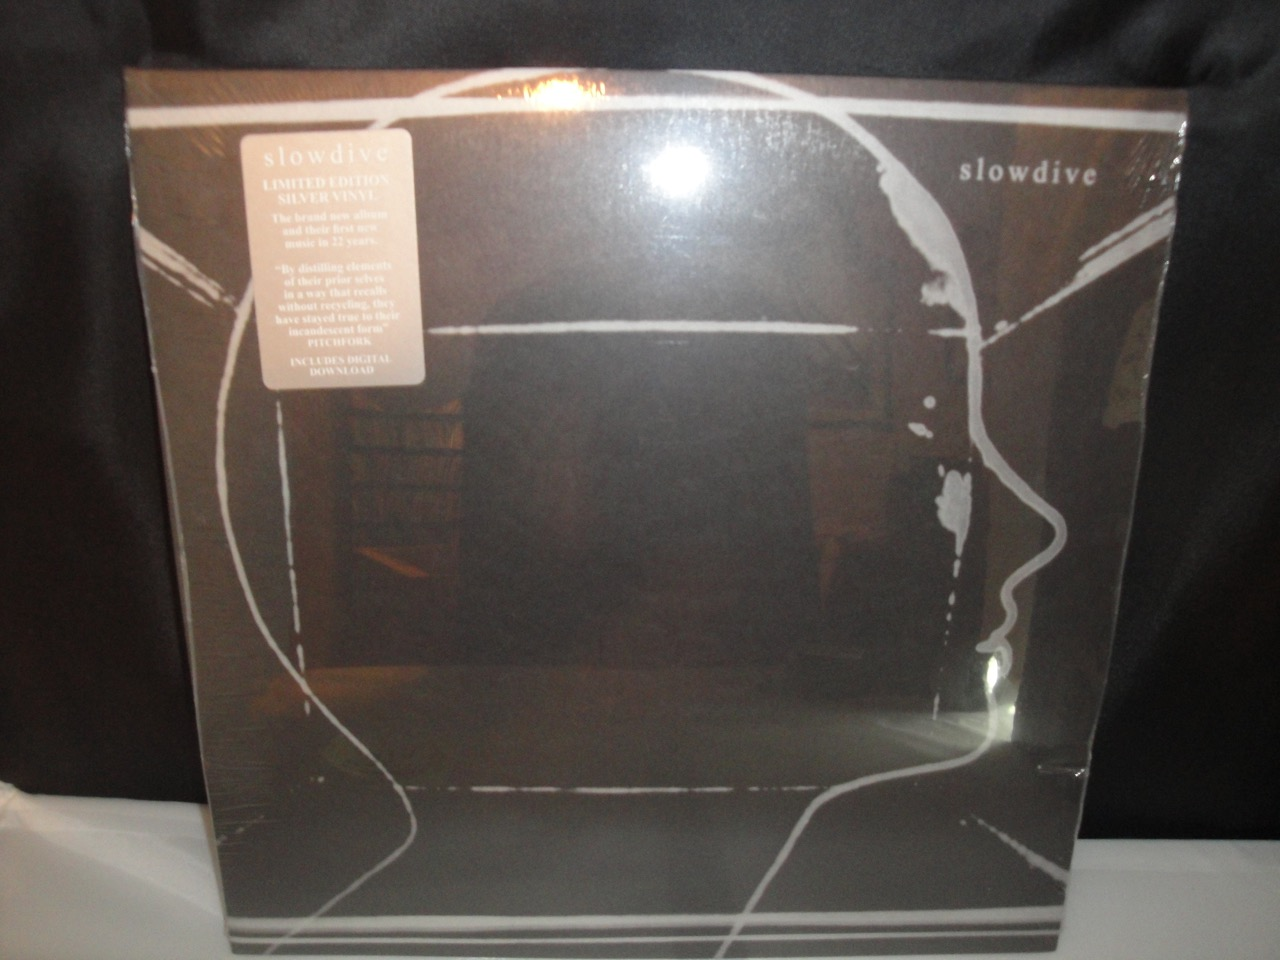 Slowdive - Slowdive - Limited Edition Colored Vinyl LP 2017